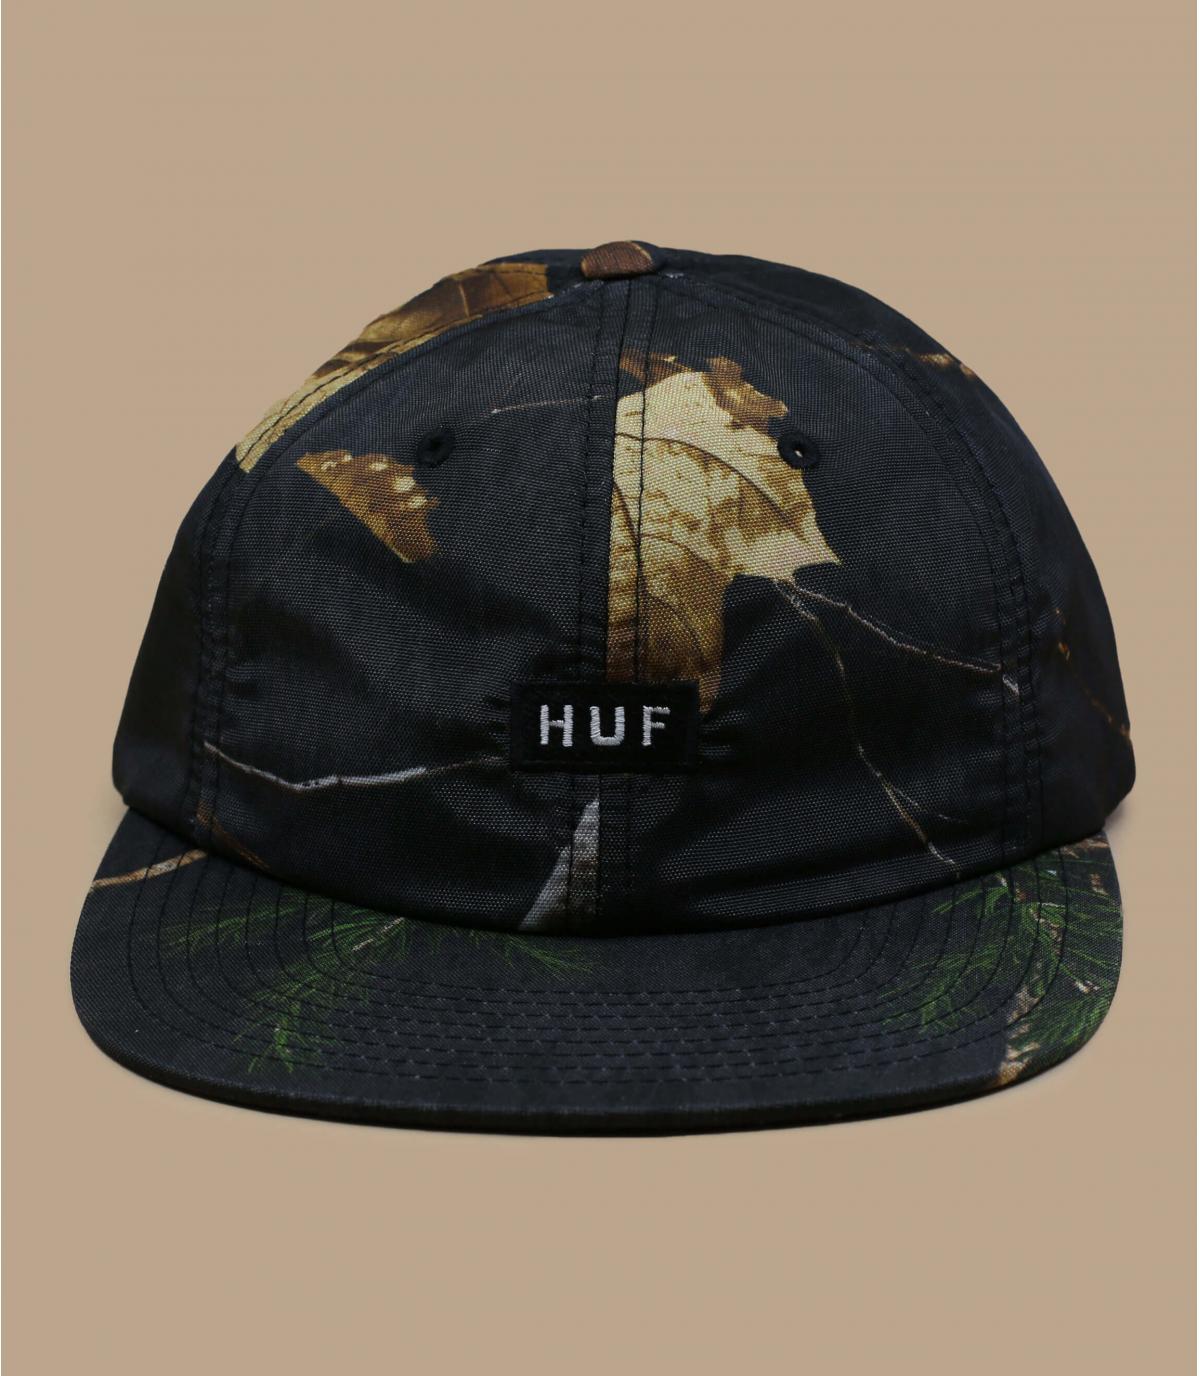 Realtree Huf cap